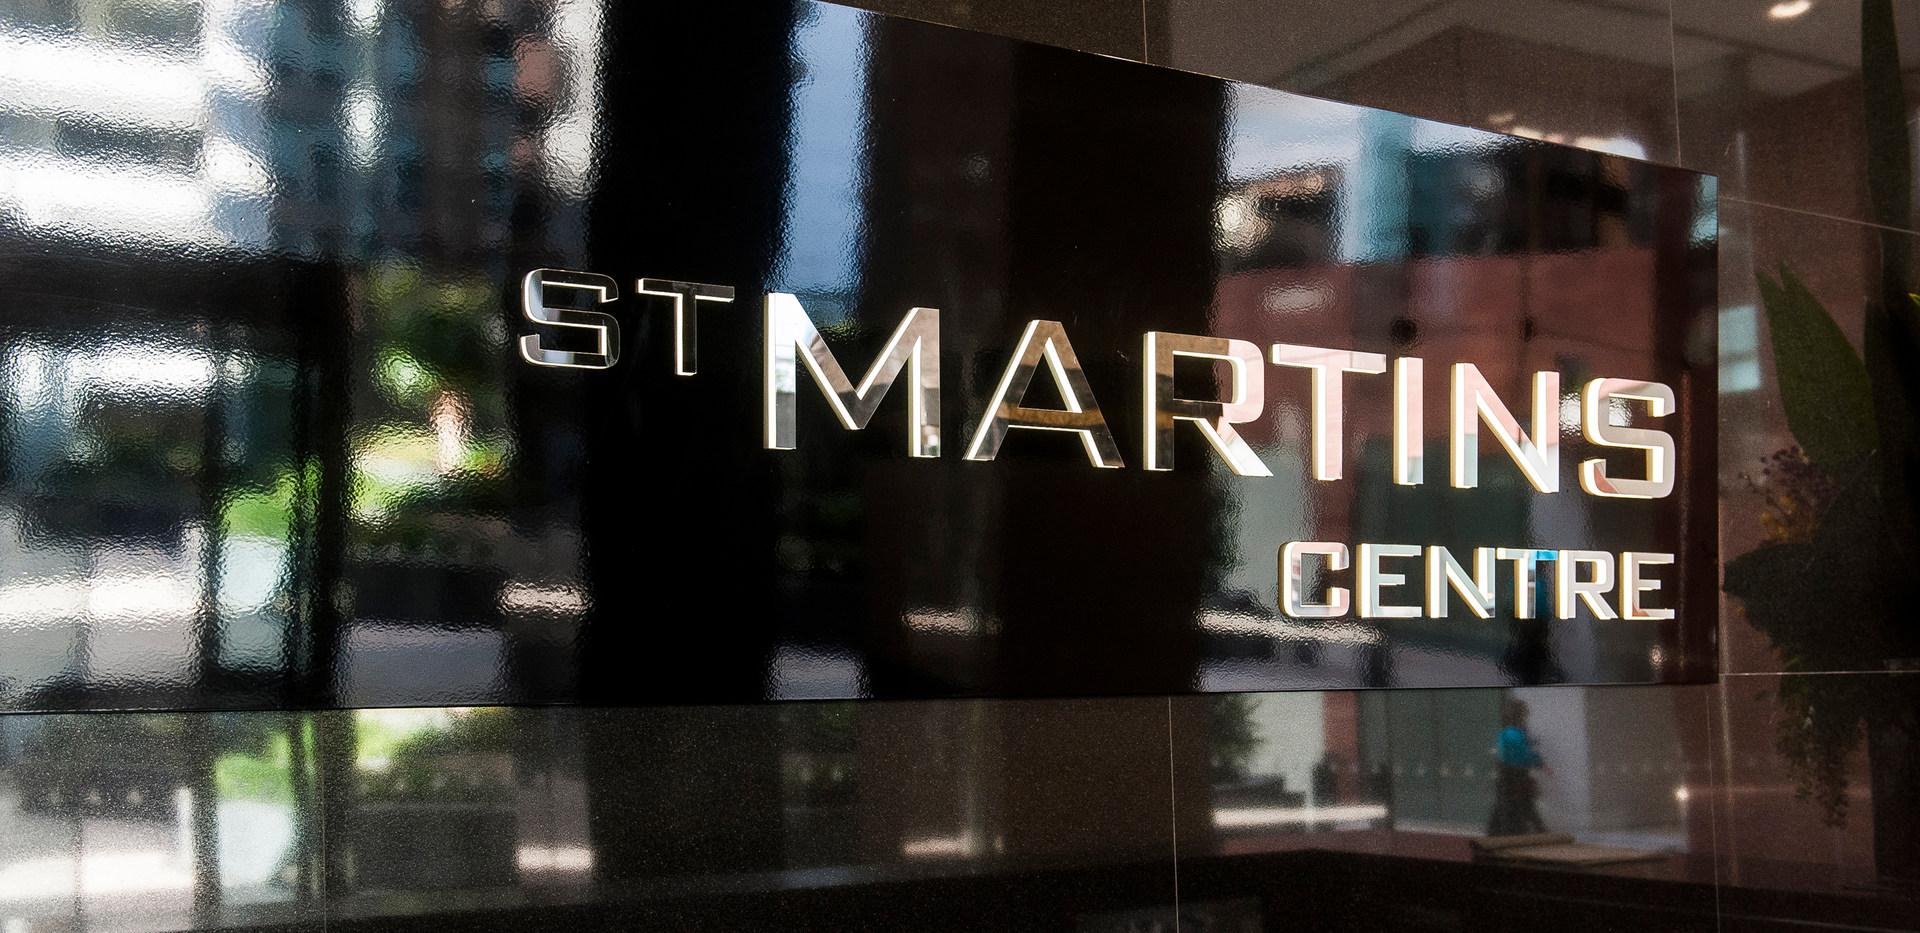 st-martins-centre-152.jpg